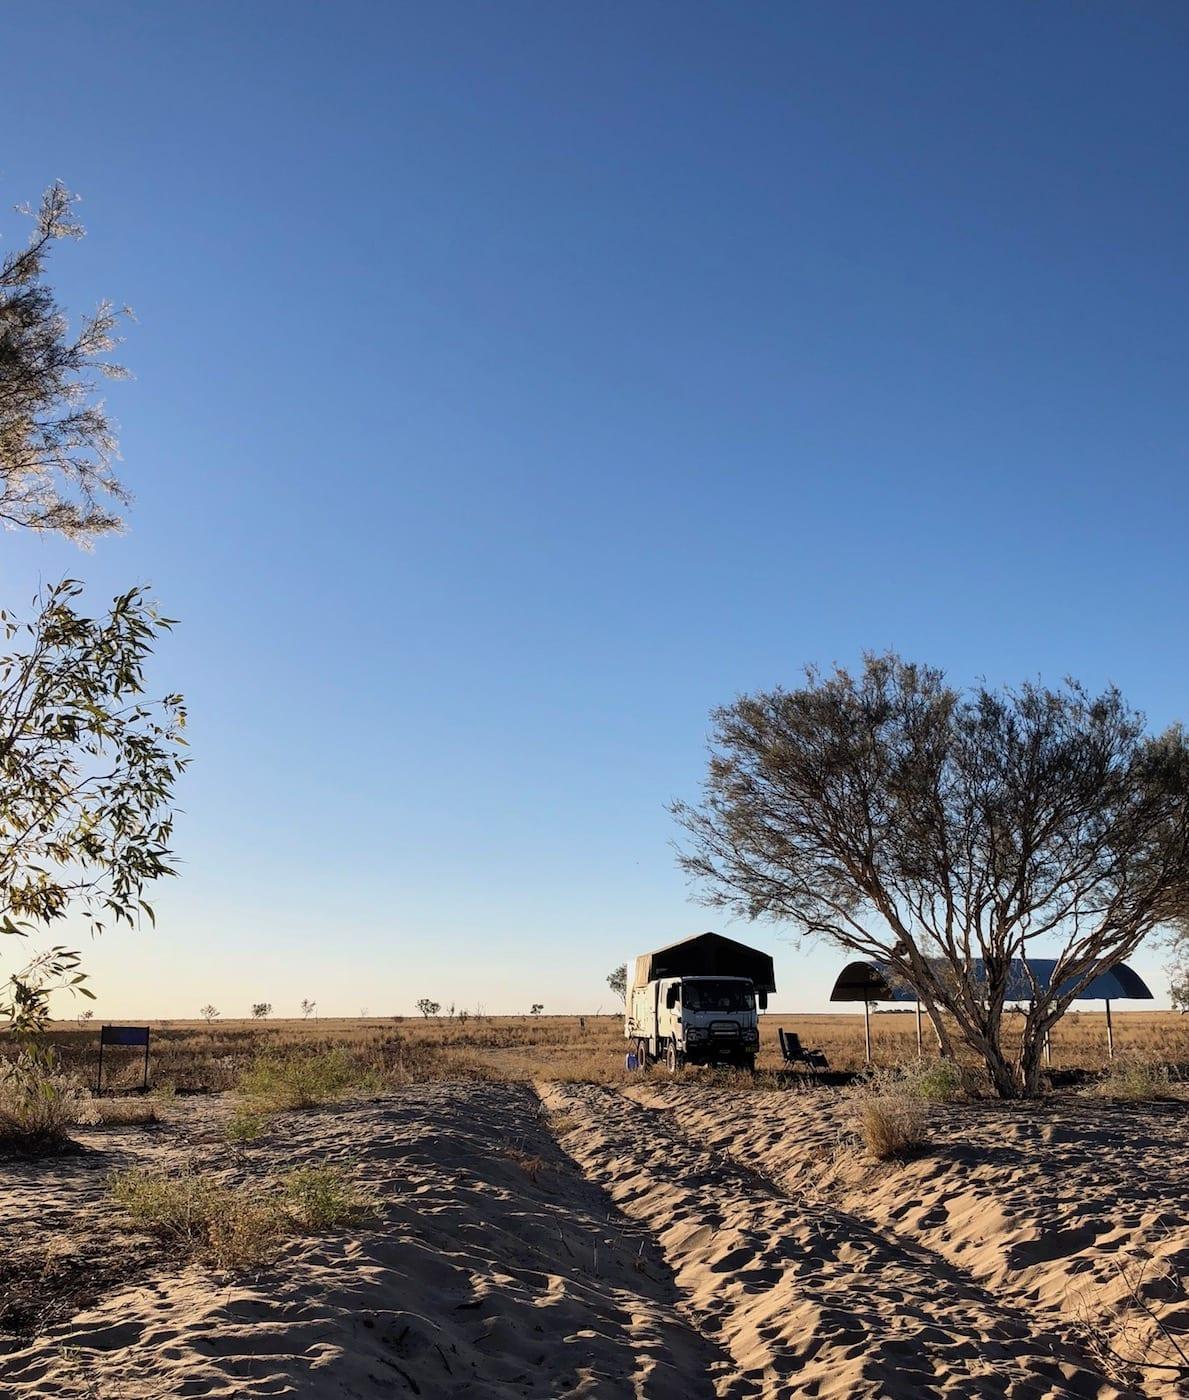 Camping in Paruku IPA